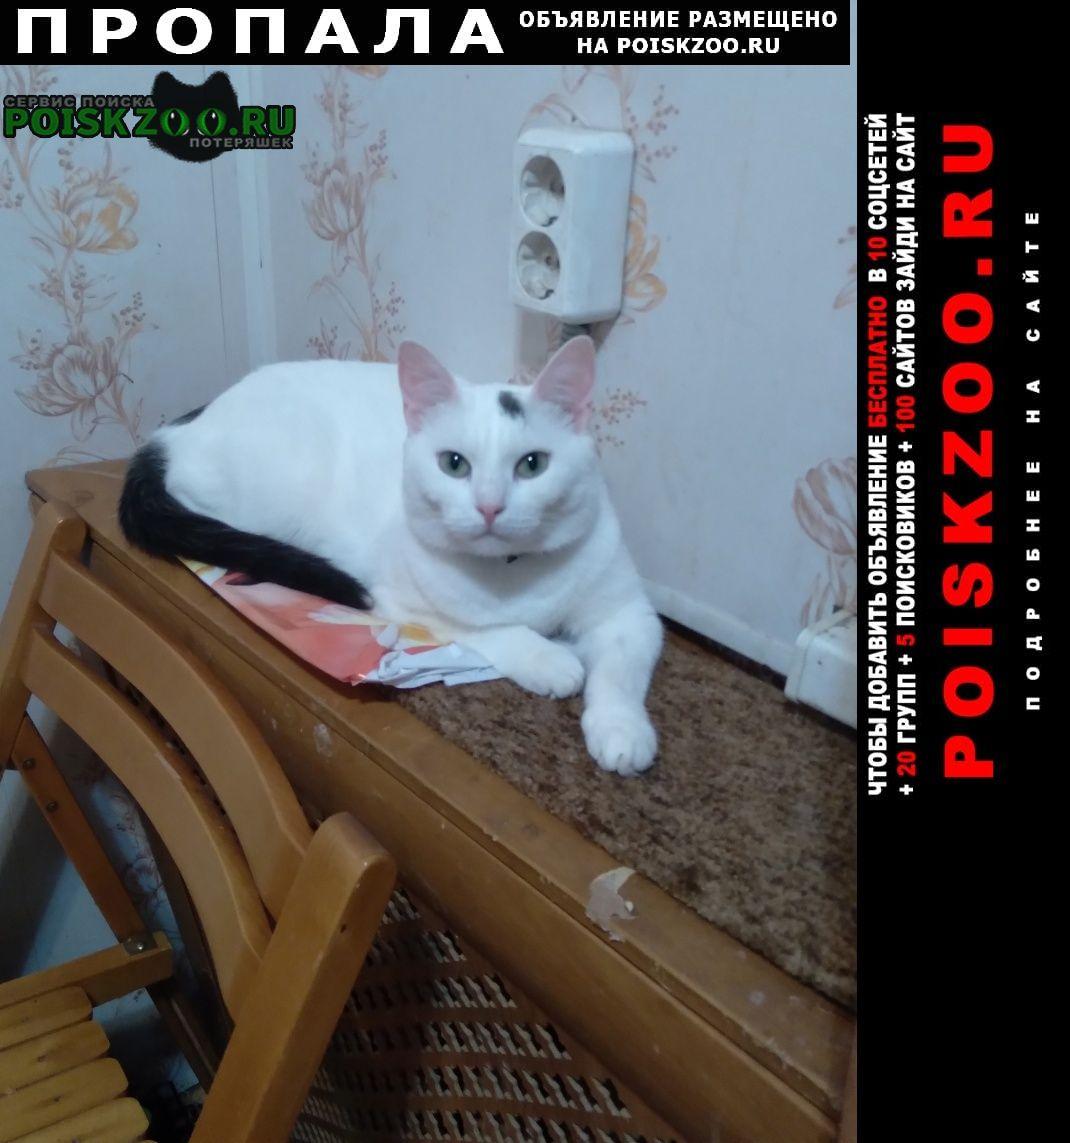 Пропала кошка Рыбинск